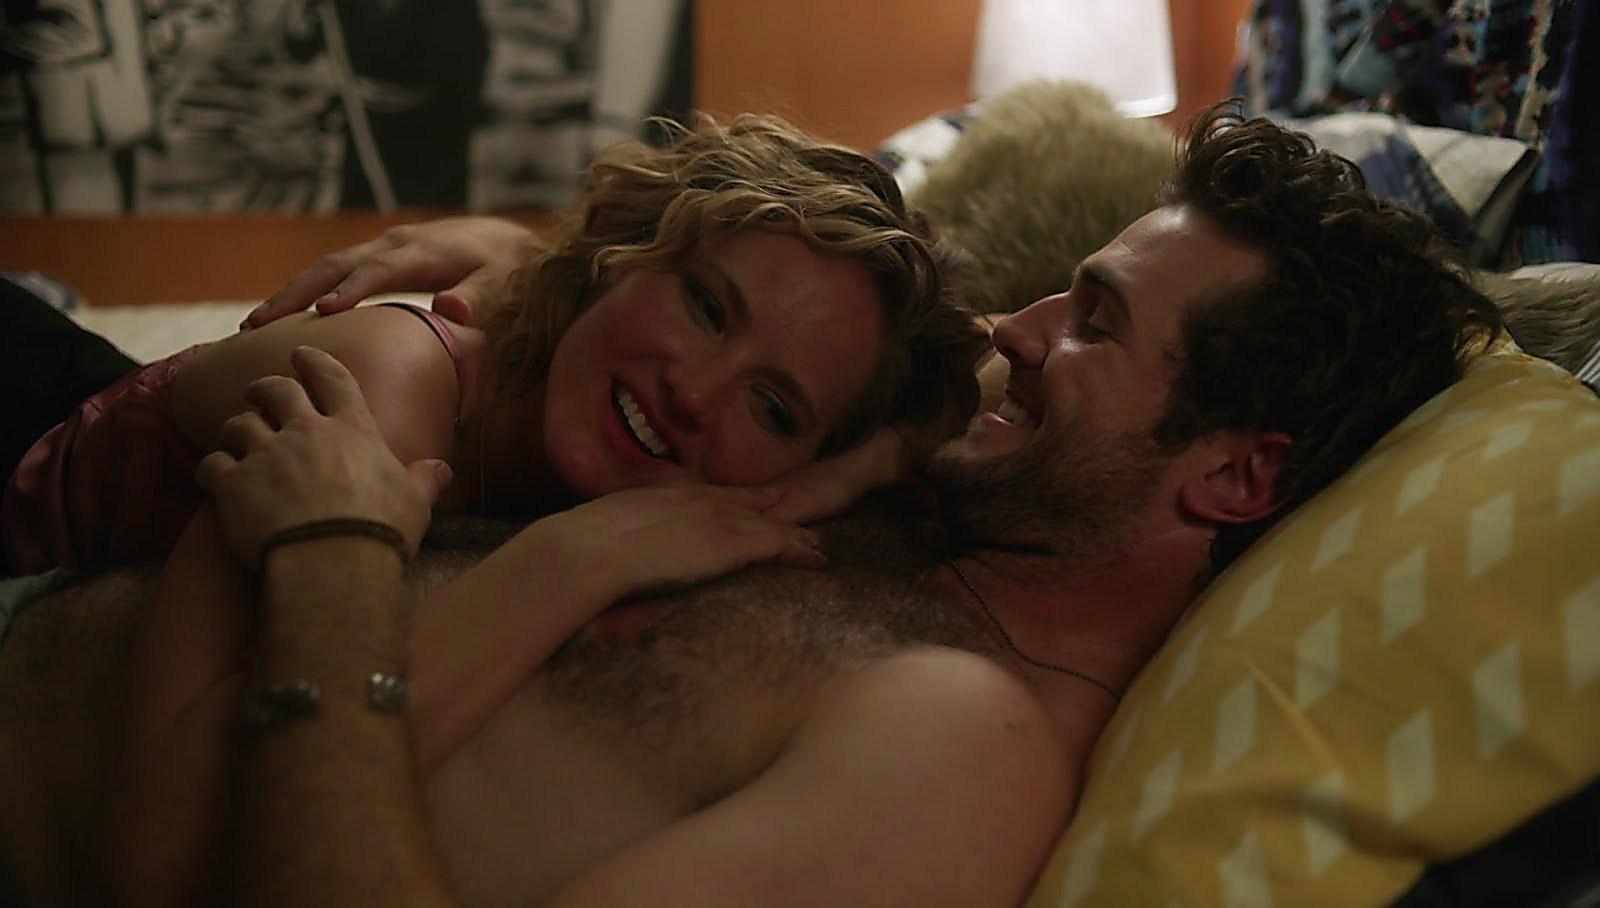 Beau Mirchoff sexy shirtless scene October 10, 2017, 3am